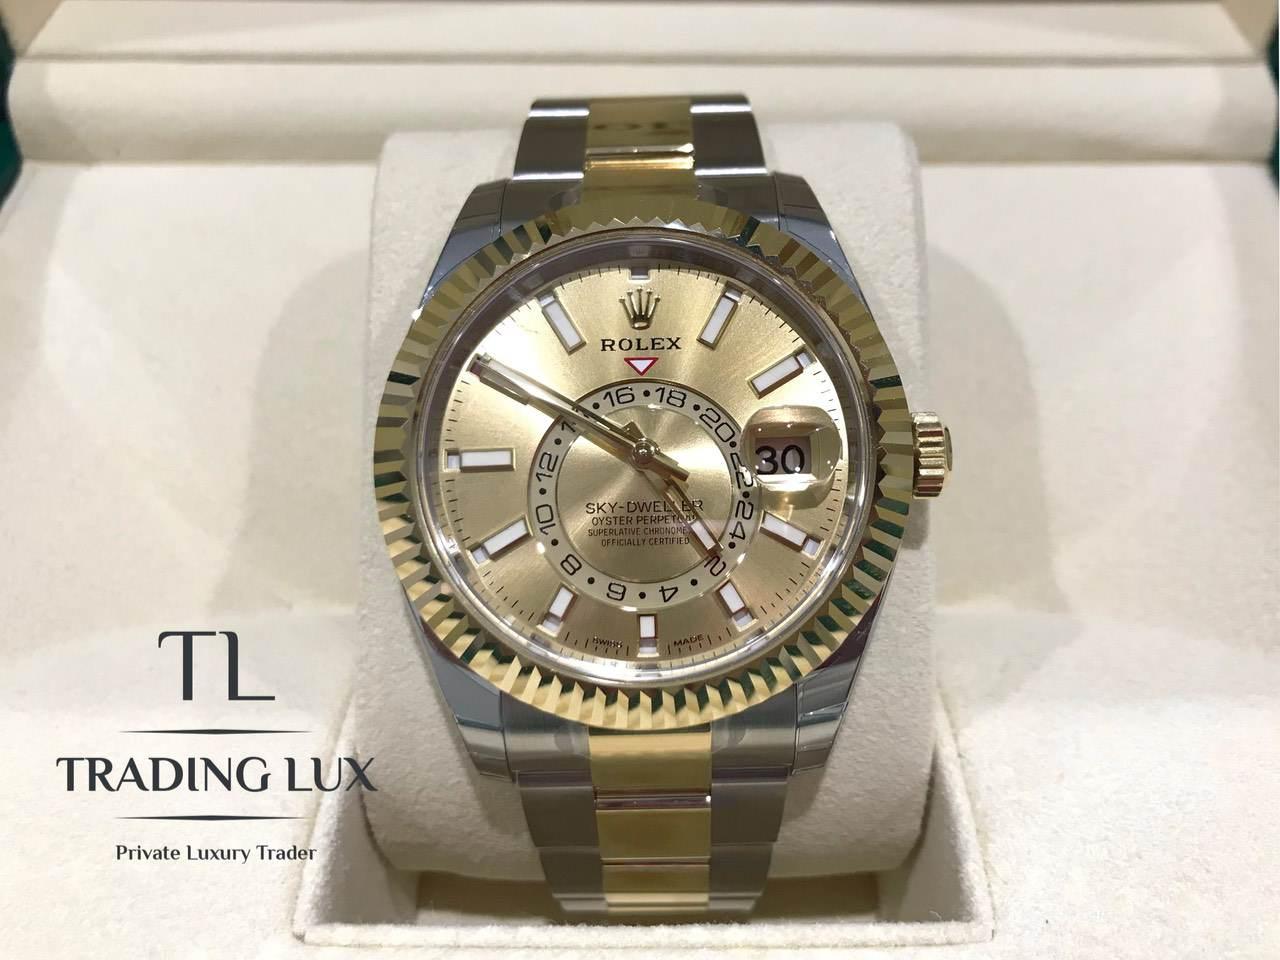 Rolex-Sky-Dweller-326933-Champagne-6